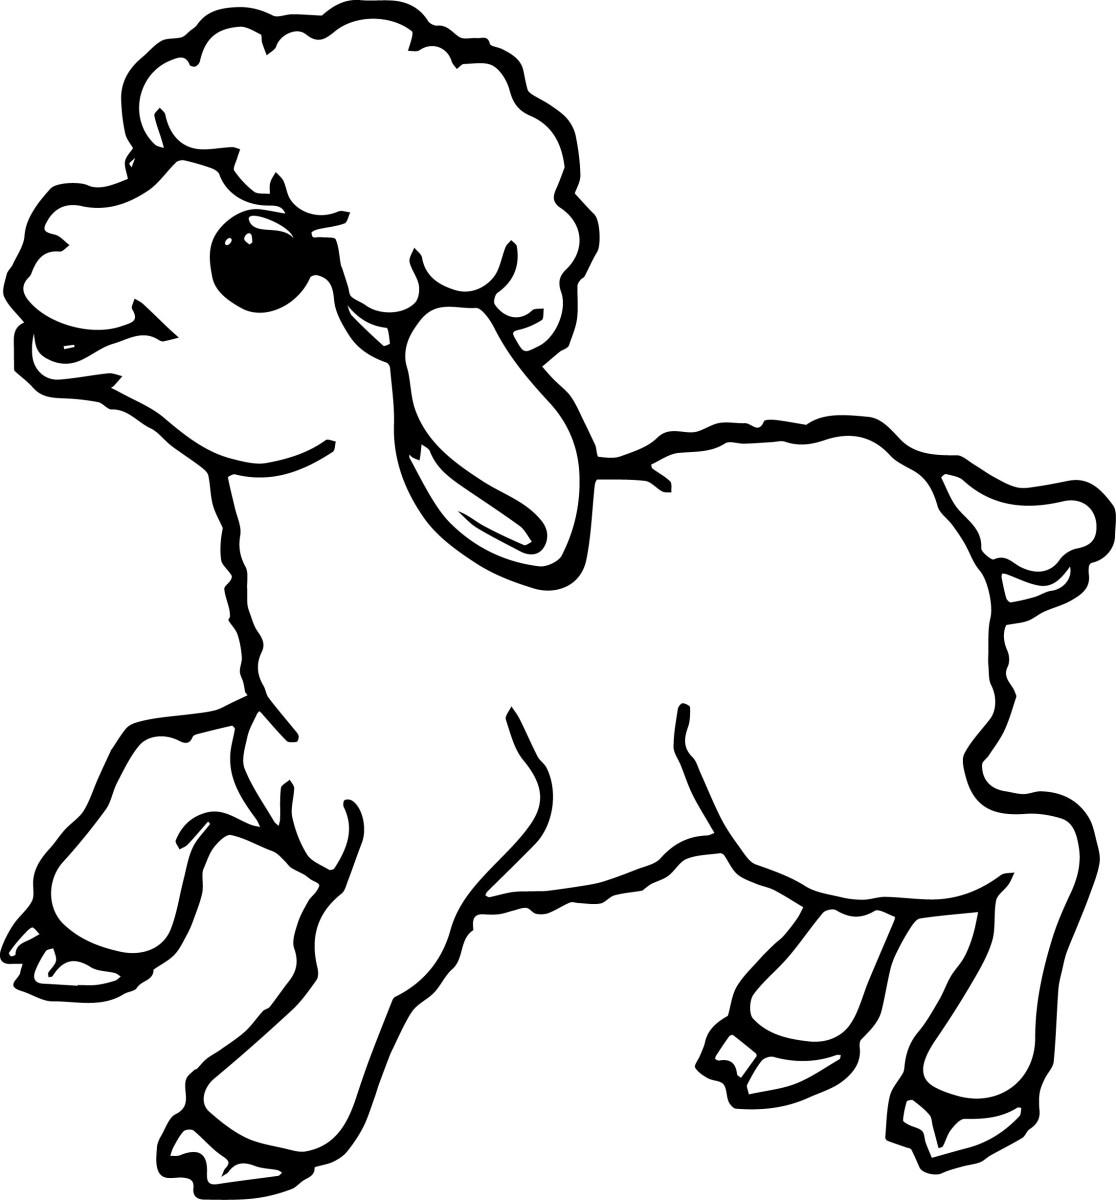 Sheep Coloring Page Cute Small Sheep Coloring Page Wecoloringpage